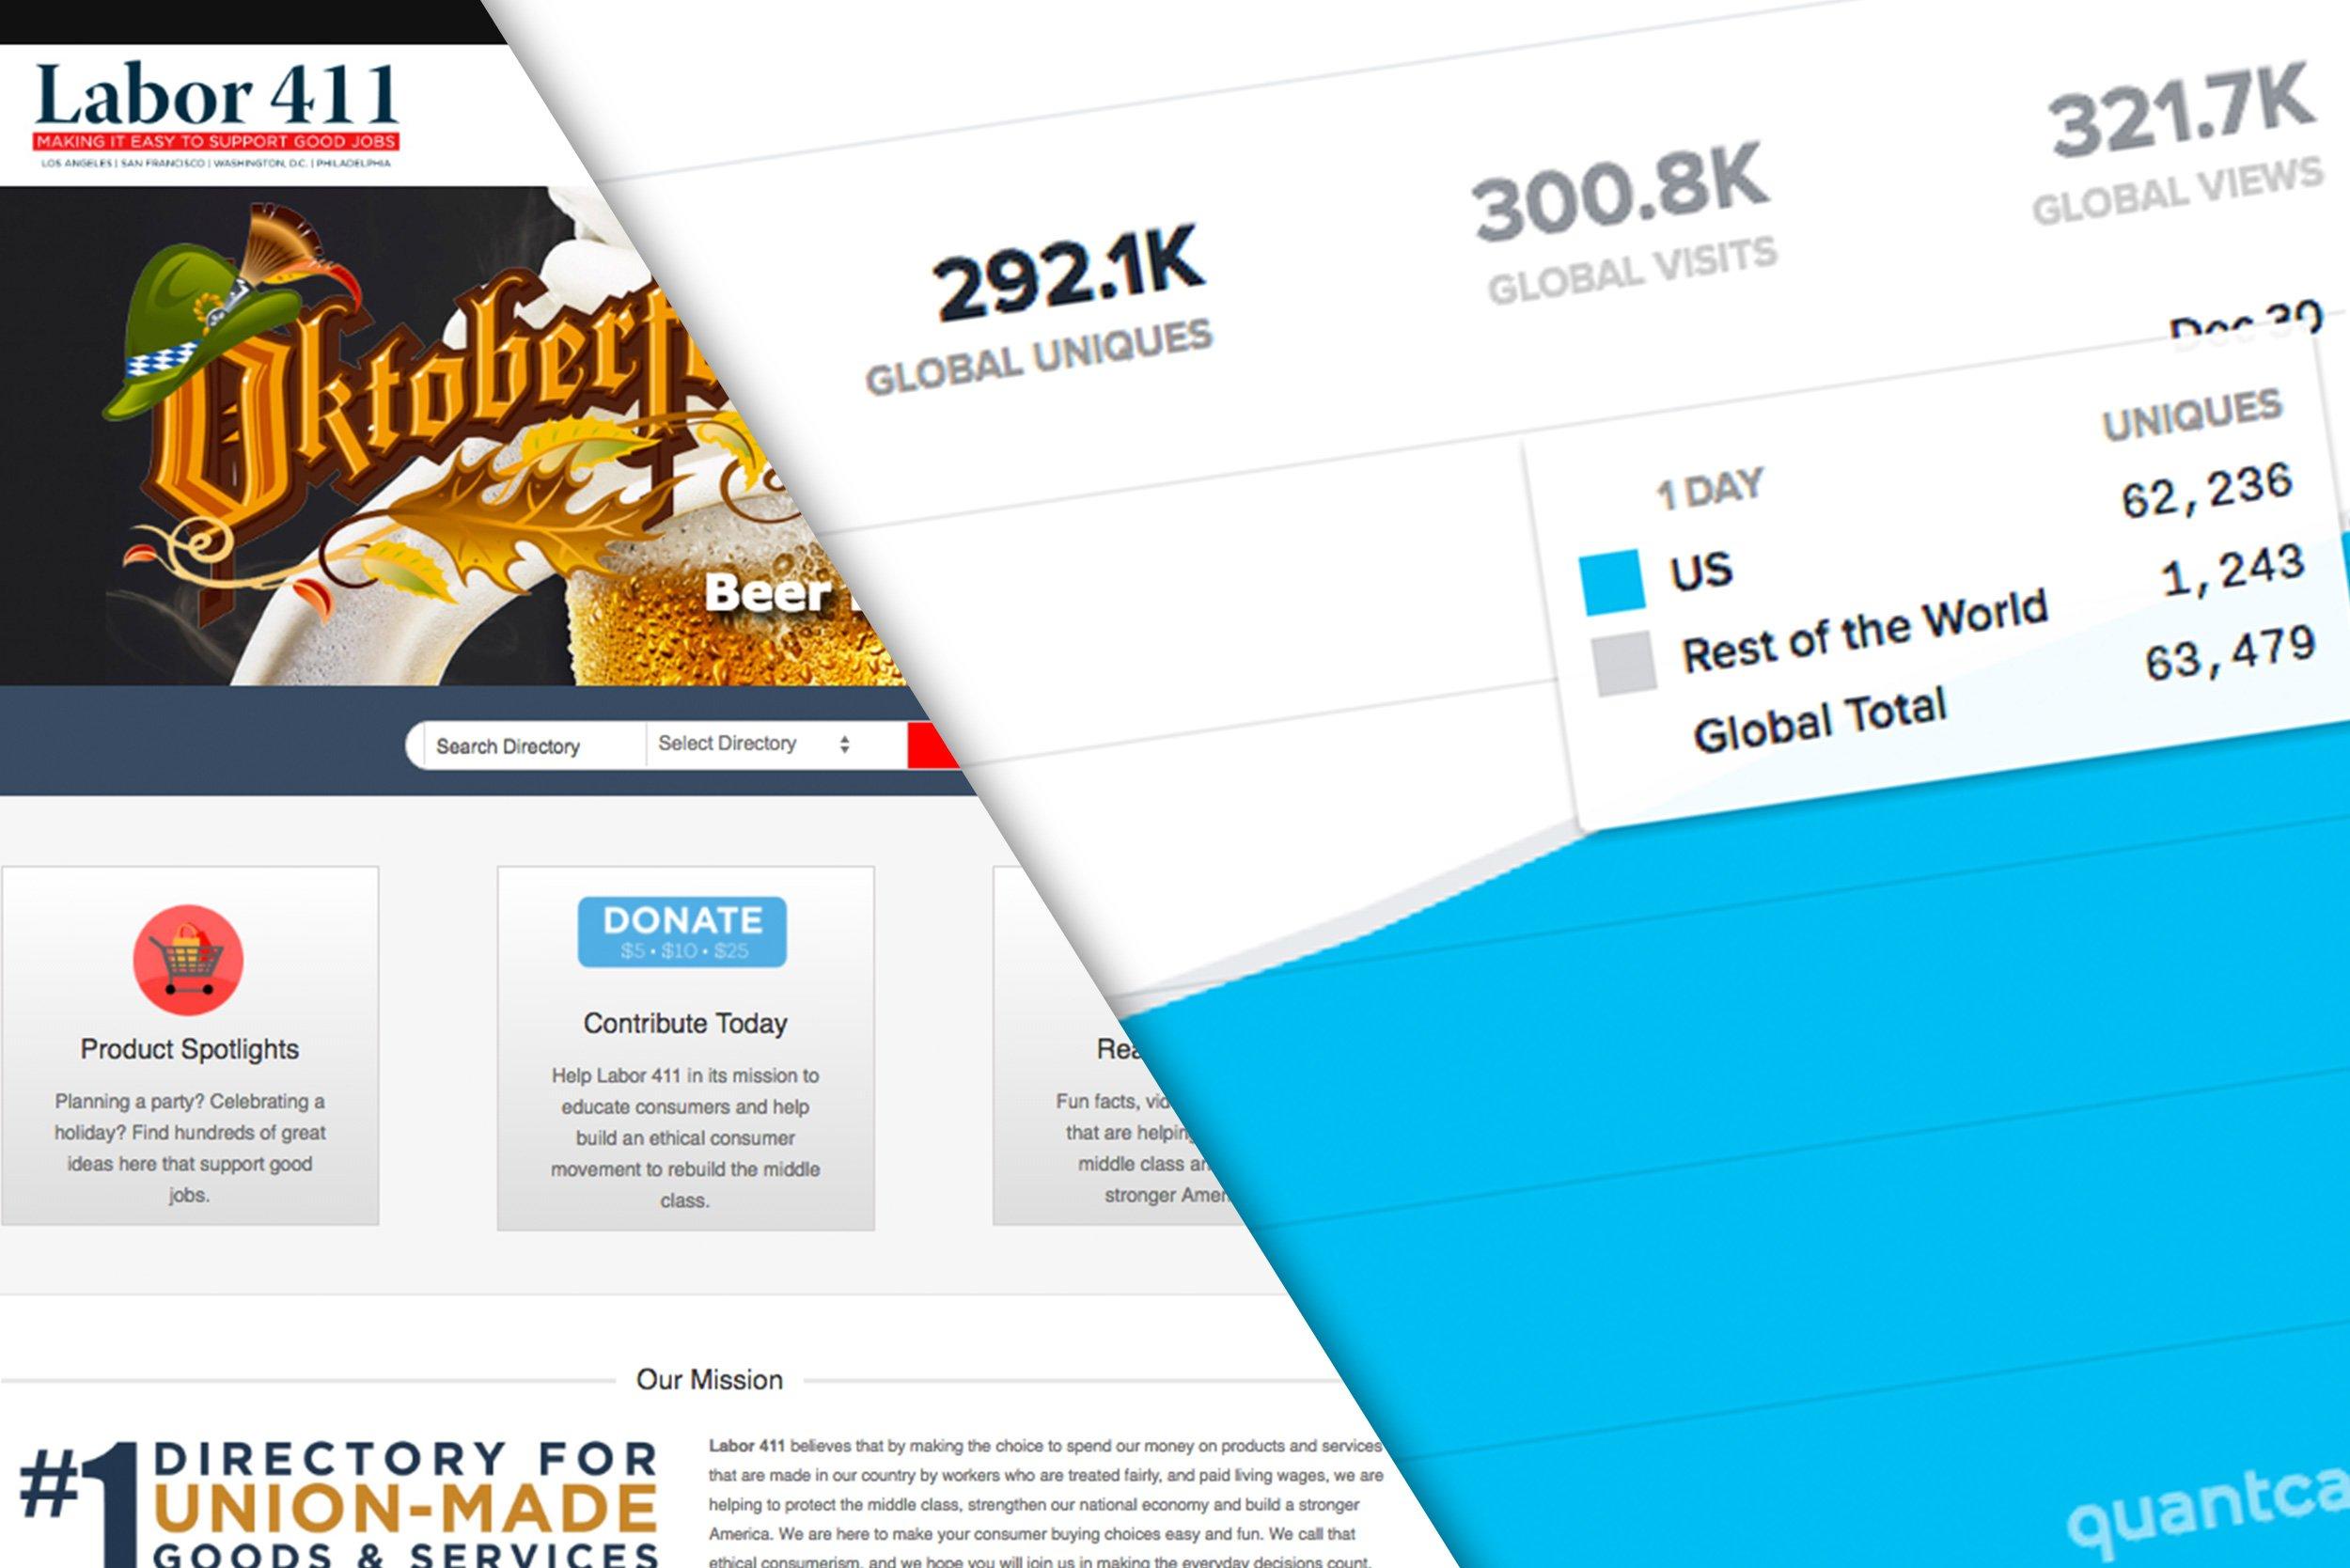 Social Media & Digital Outreach | Senders Communications Group